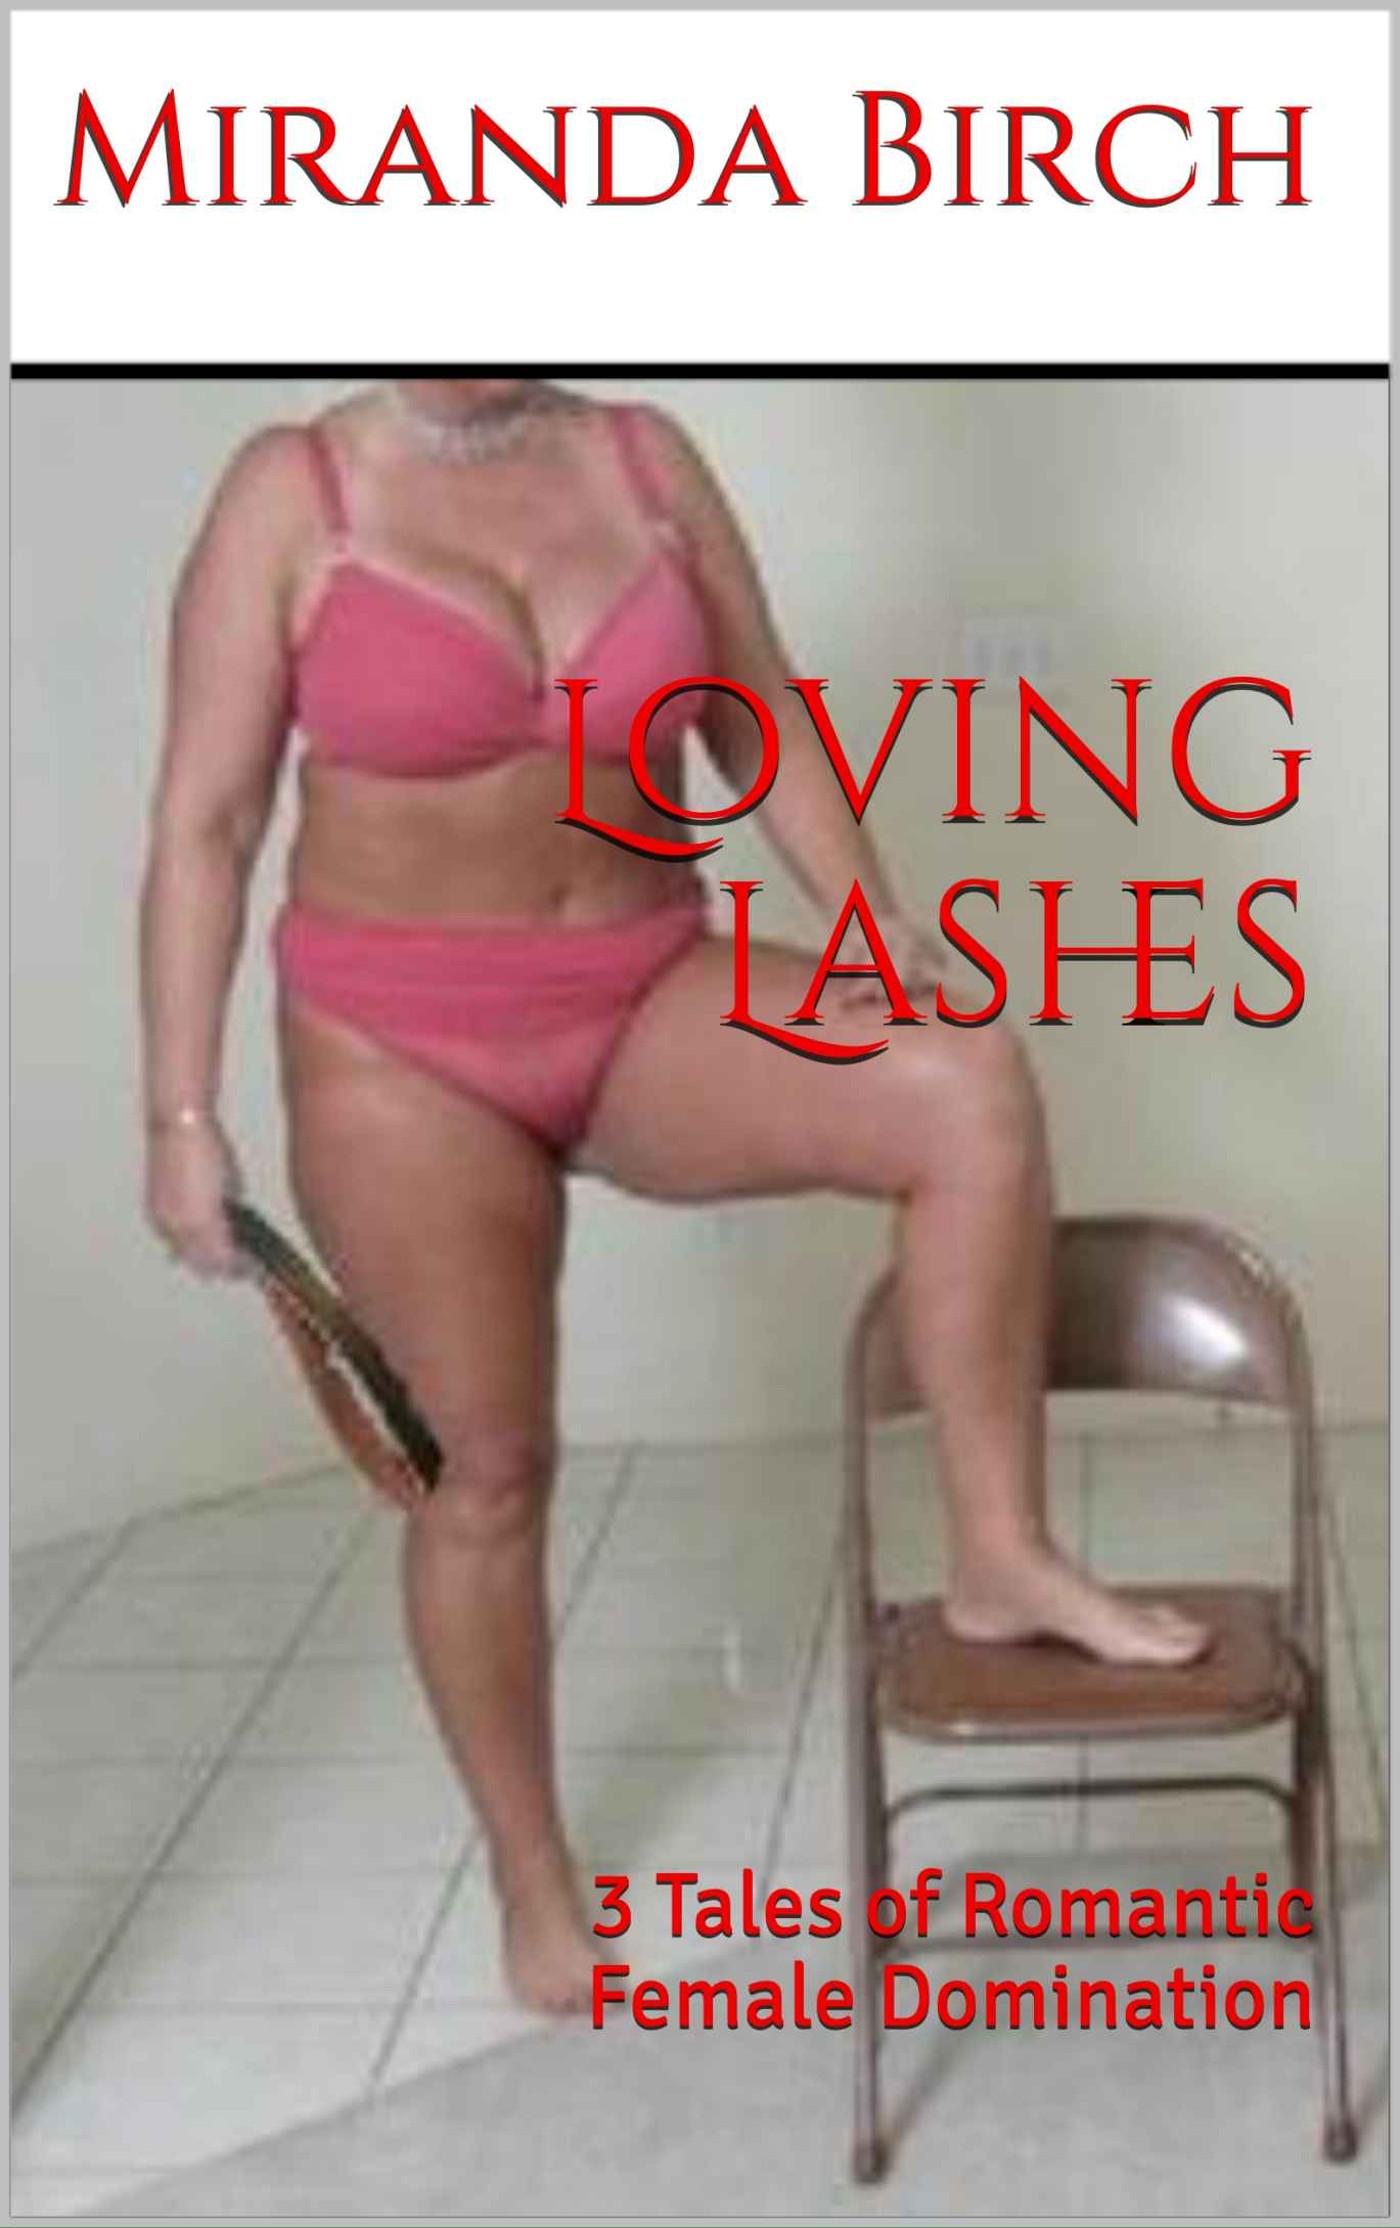 Bbw Tale Porn Images loving lashes: 3 tales of romantic female domination, an ebookmiranda birch